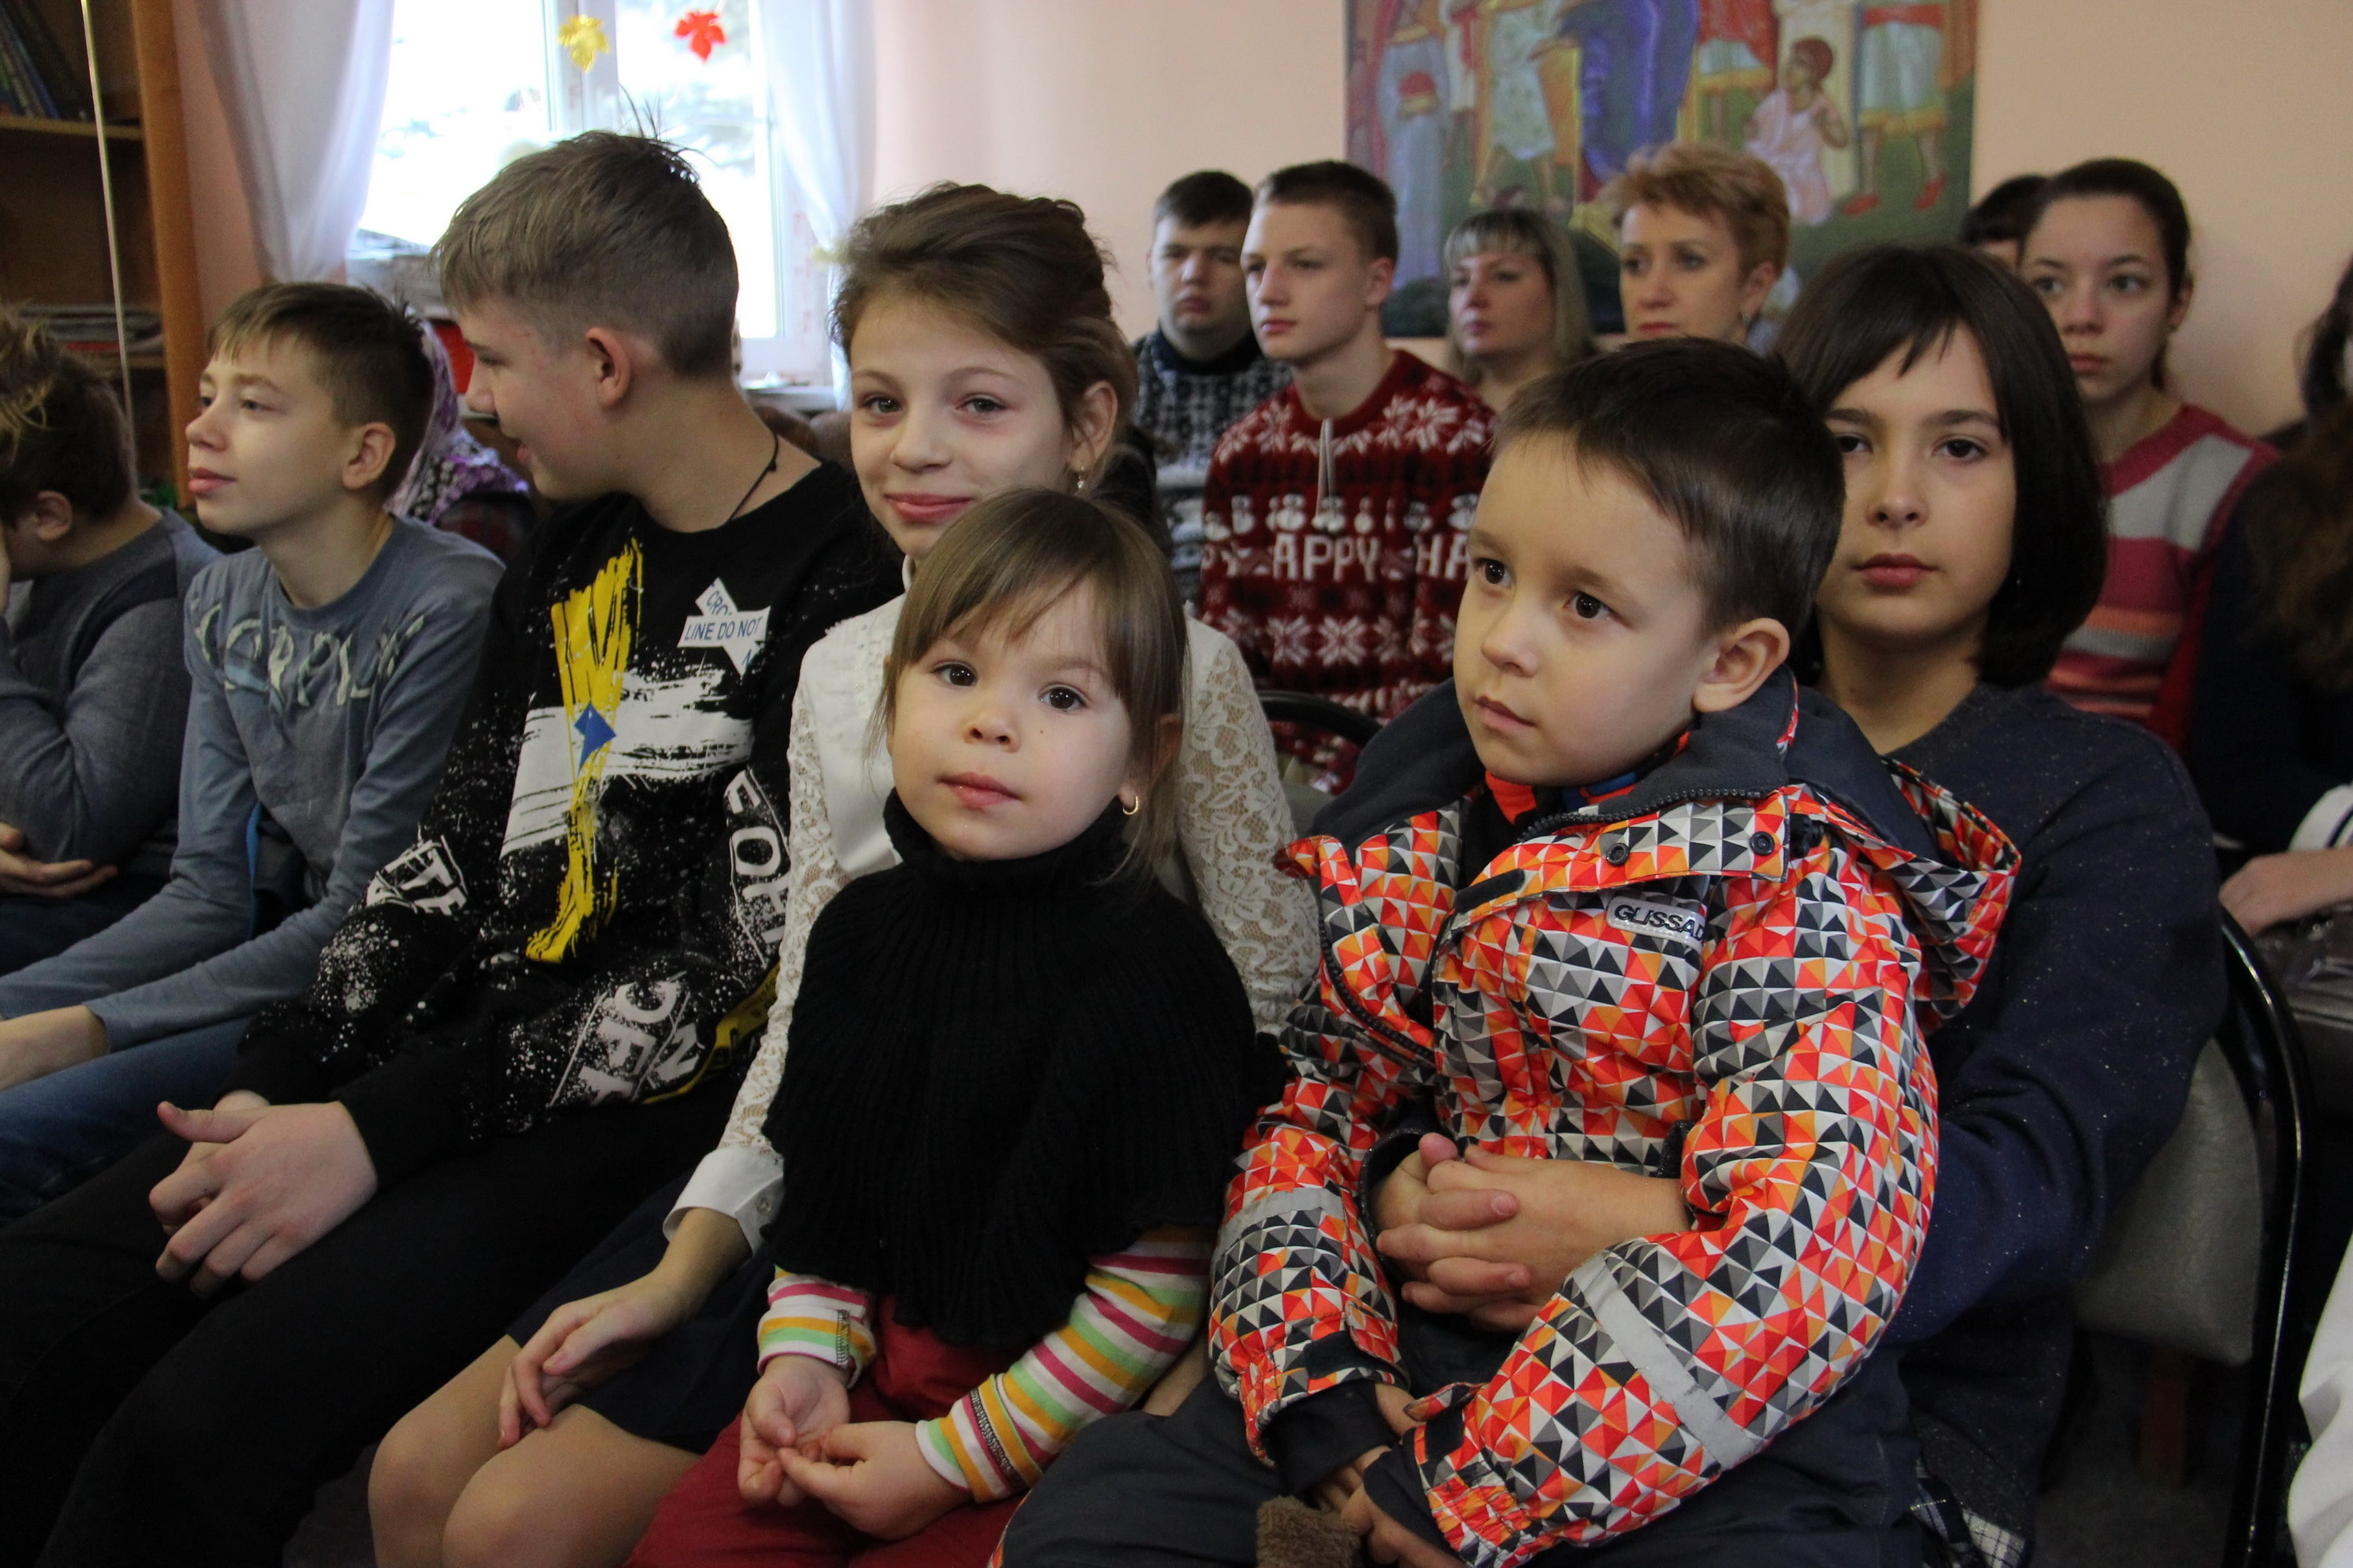 http://monuspen.ru/photoreports/b1b252ad26e1d6ada51c25ebbc9be7g1.JPG